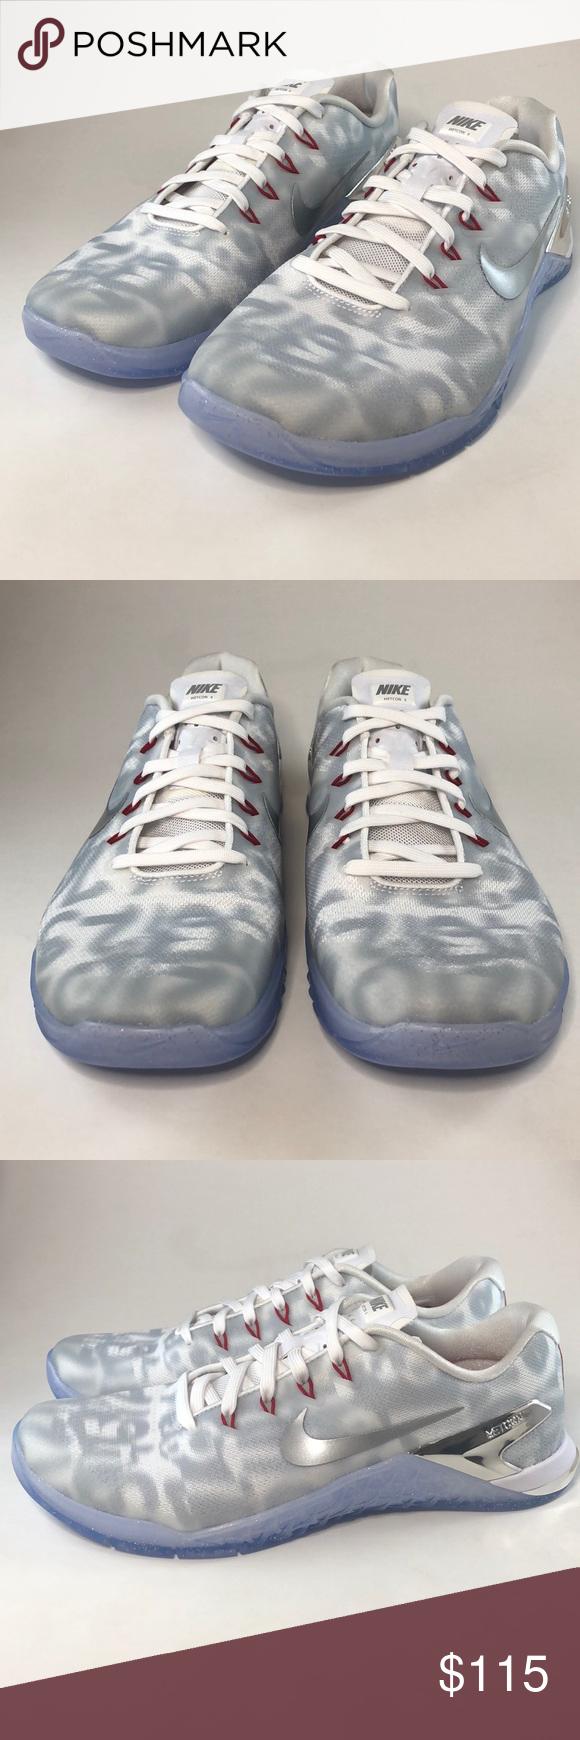 Nike metcon, Womens shoes sneakers, Nike